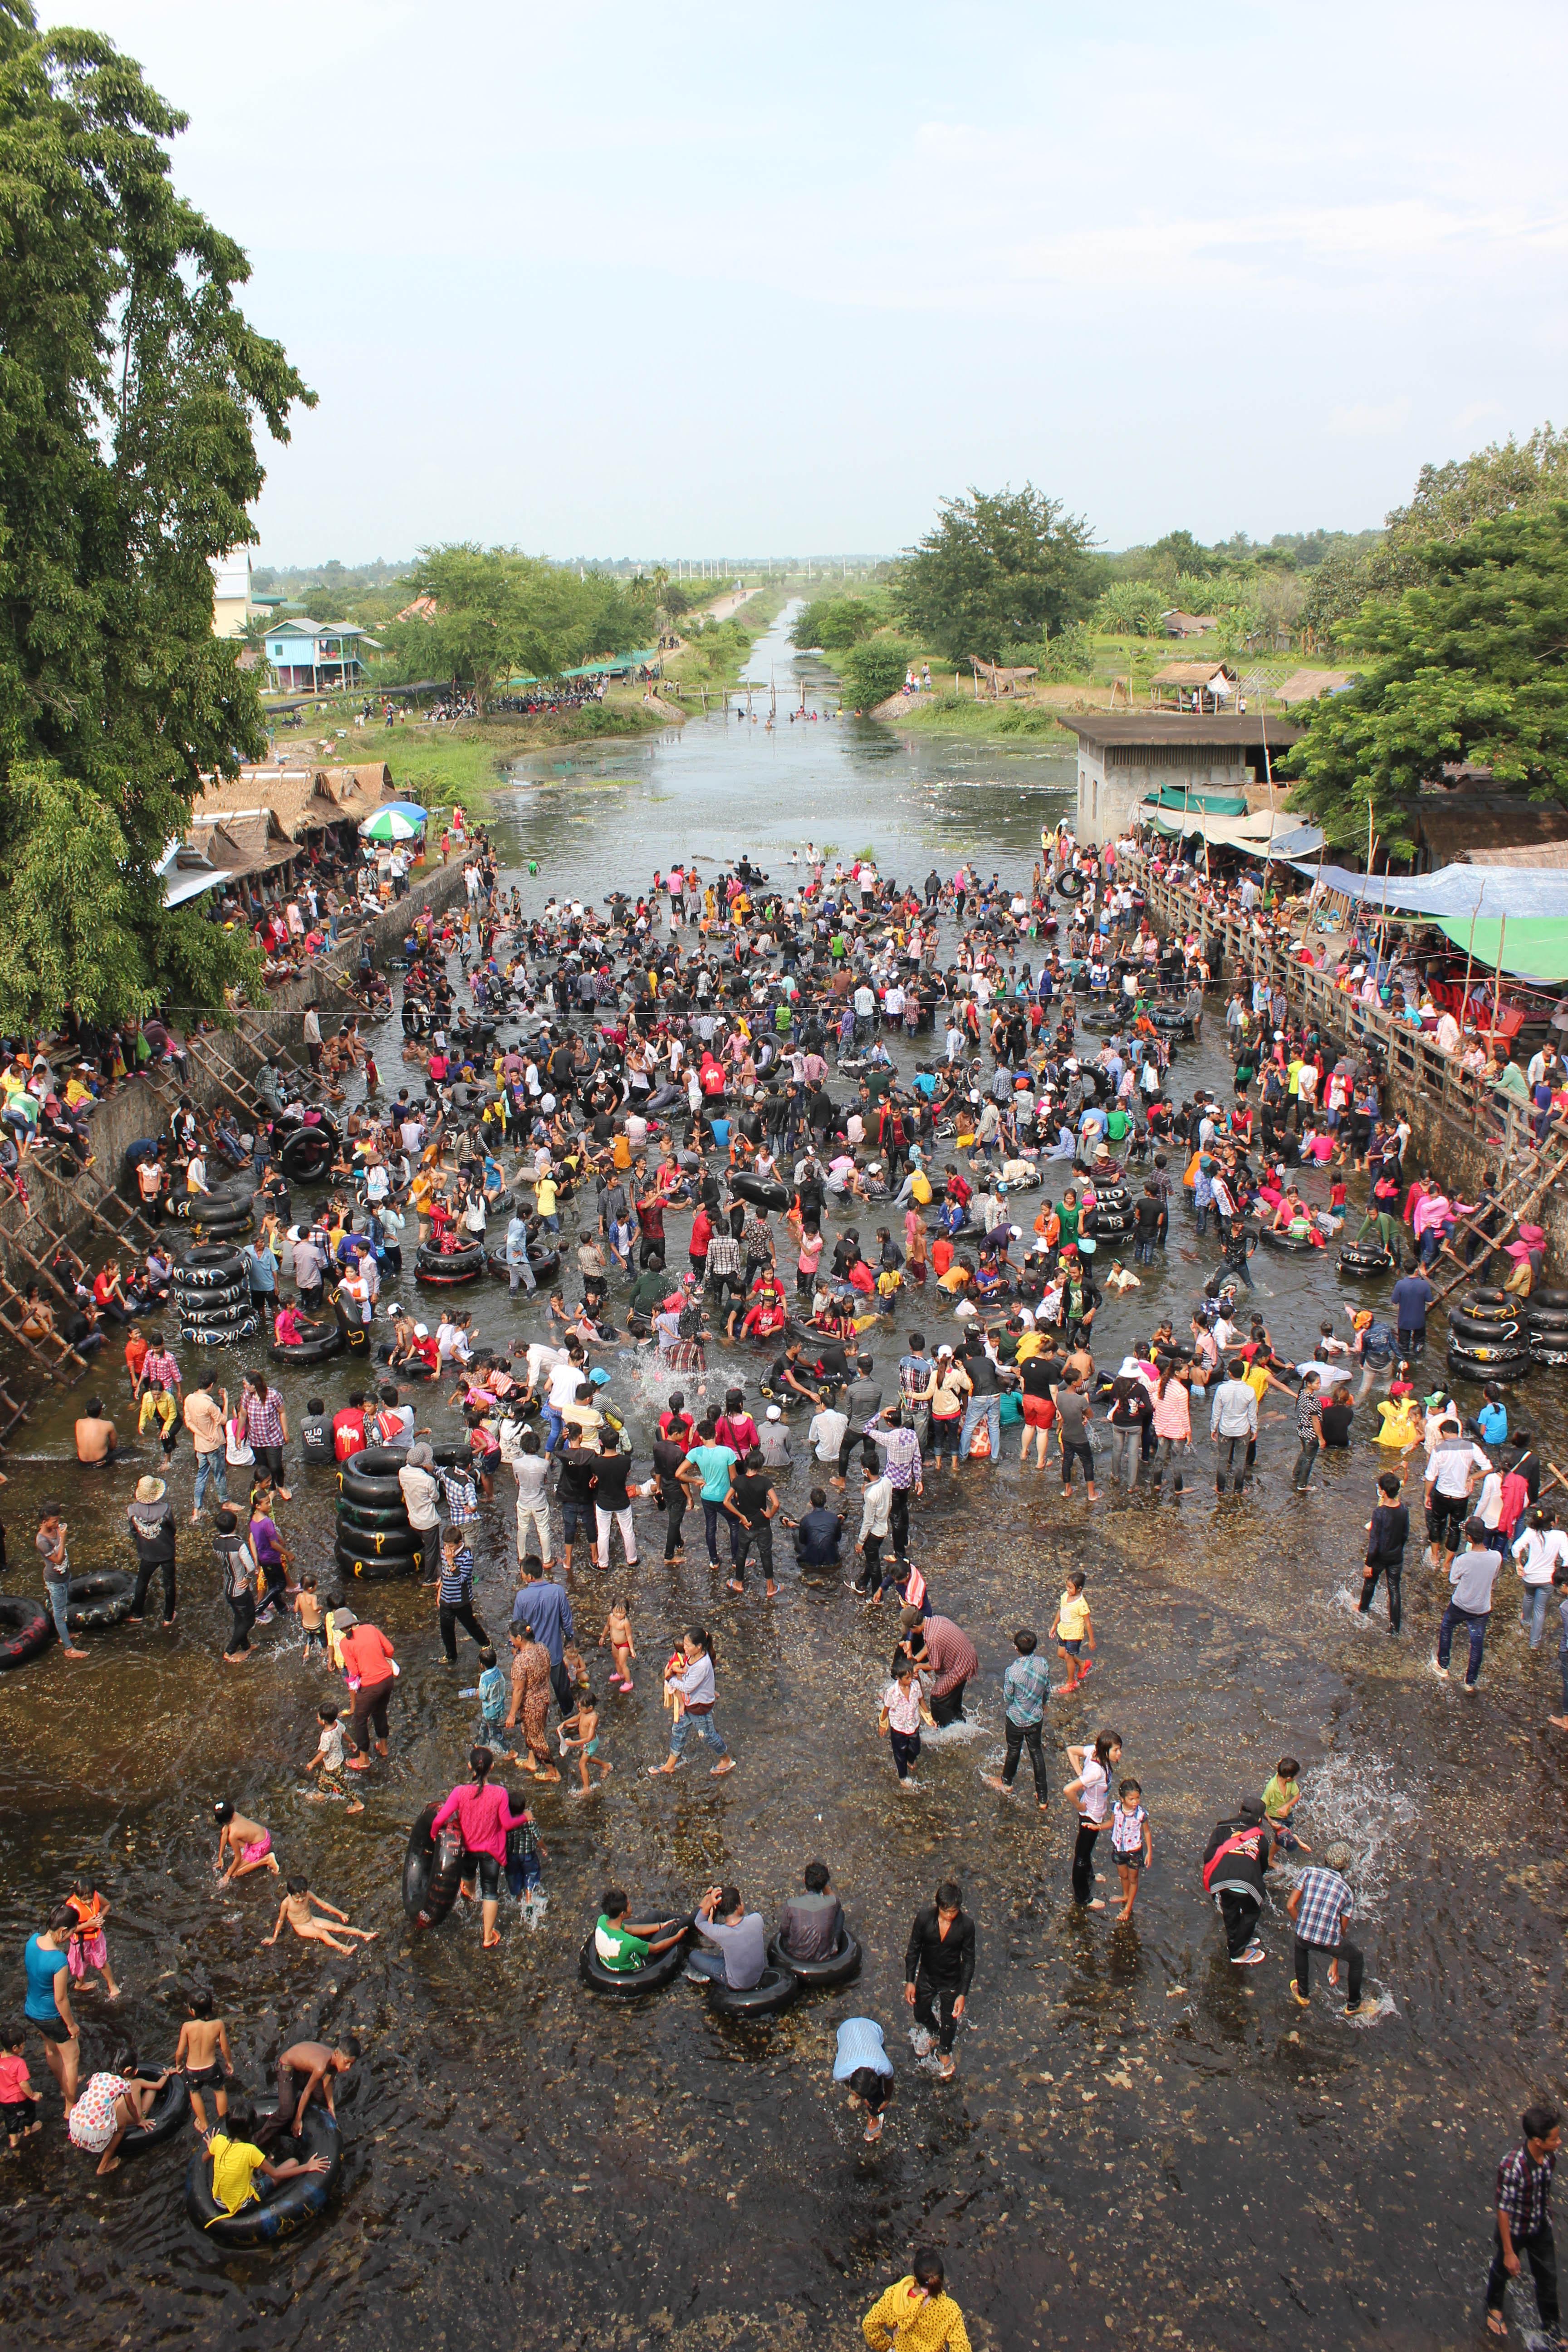 water festival in battambang cambodia adventures abroad